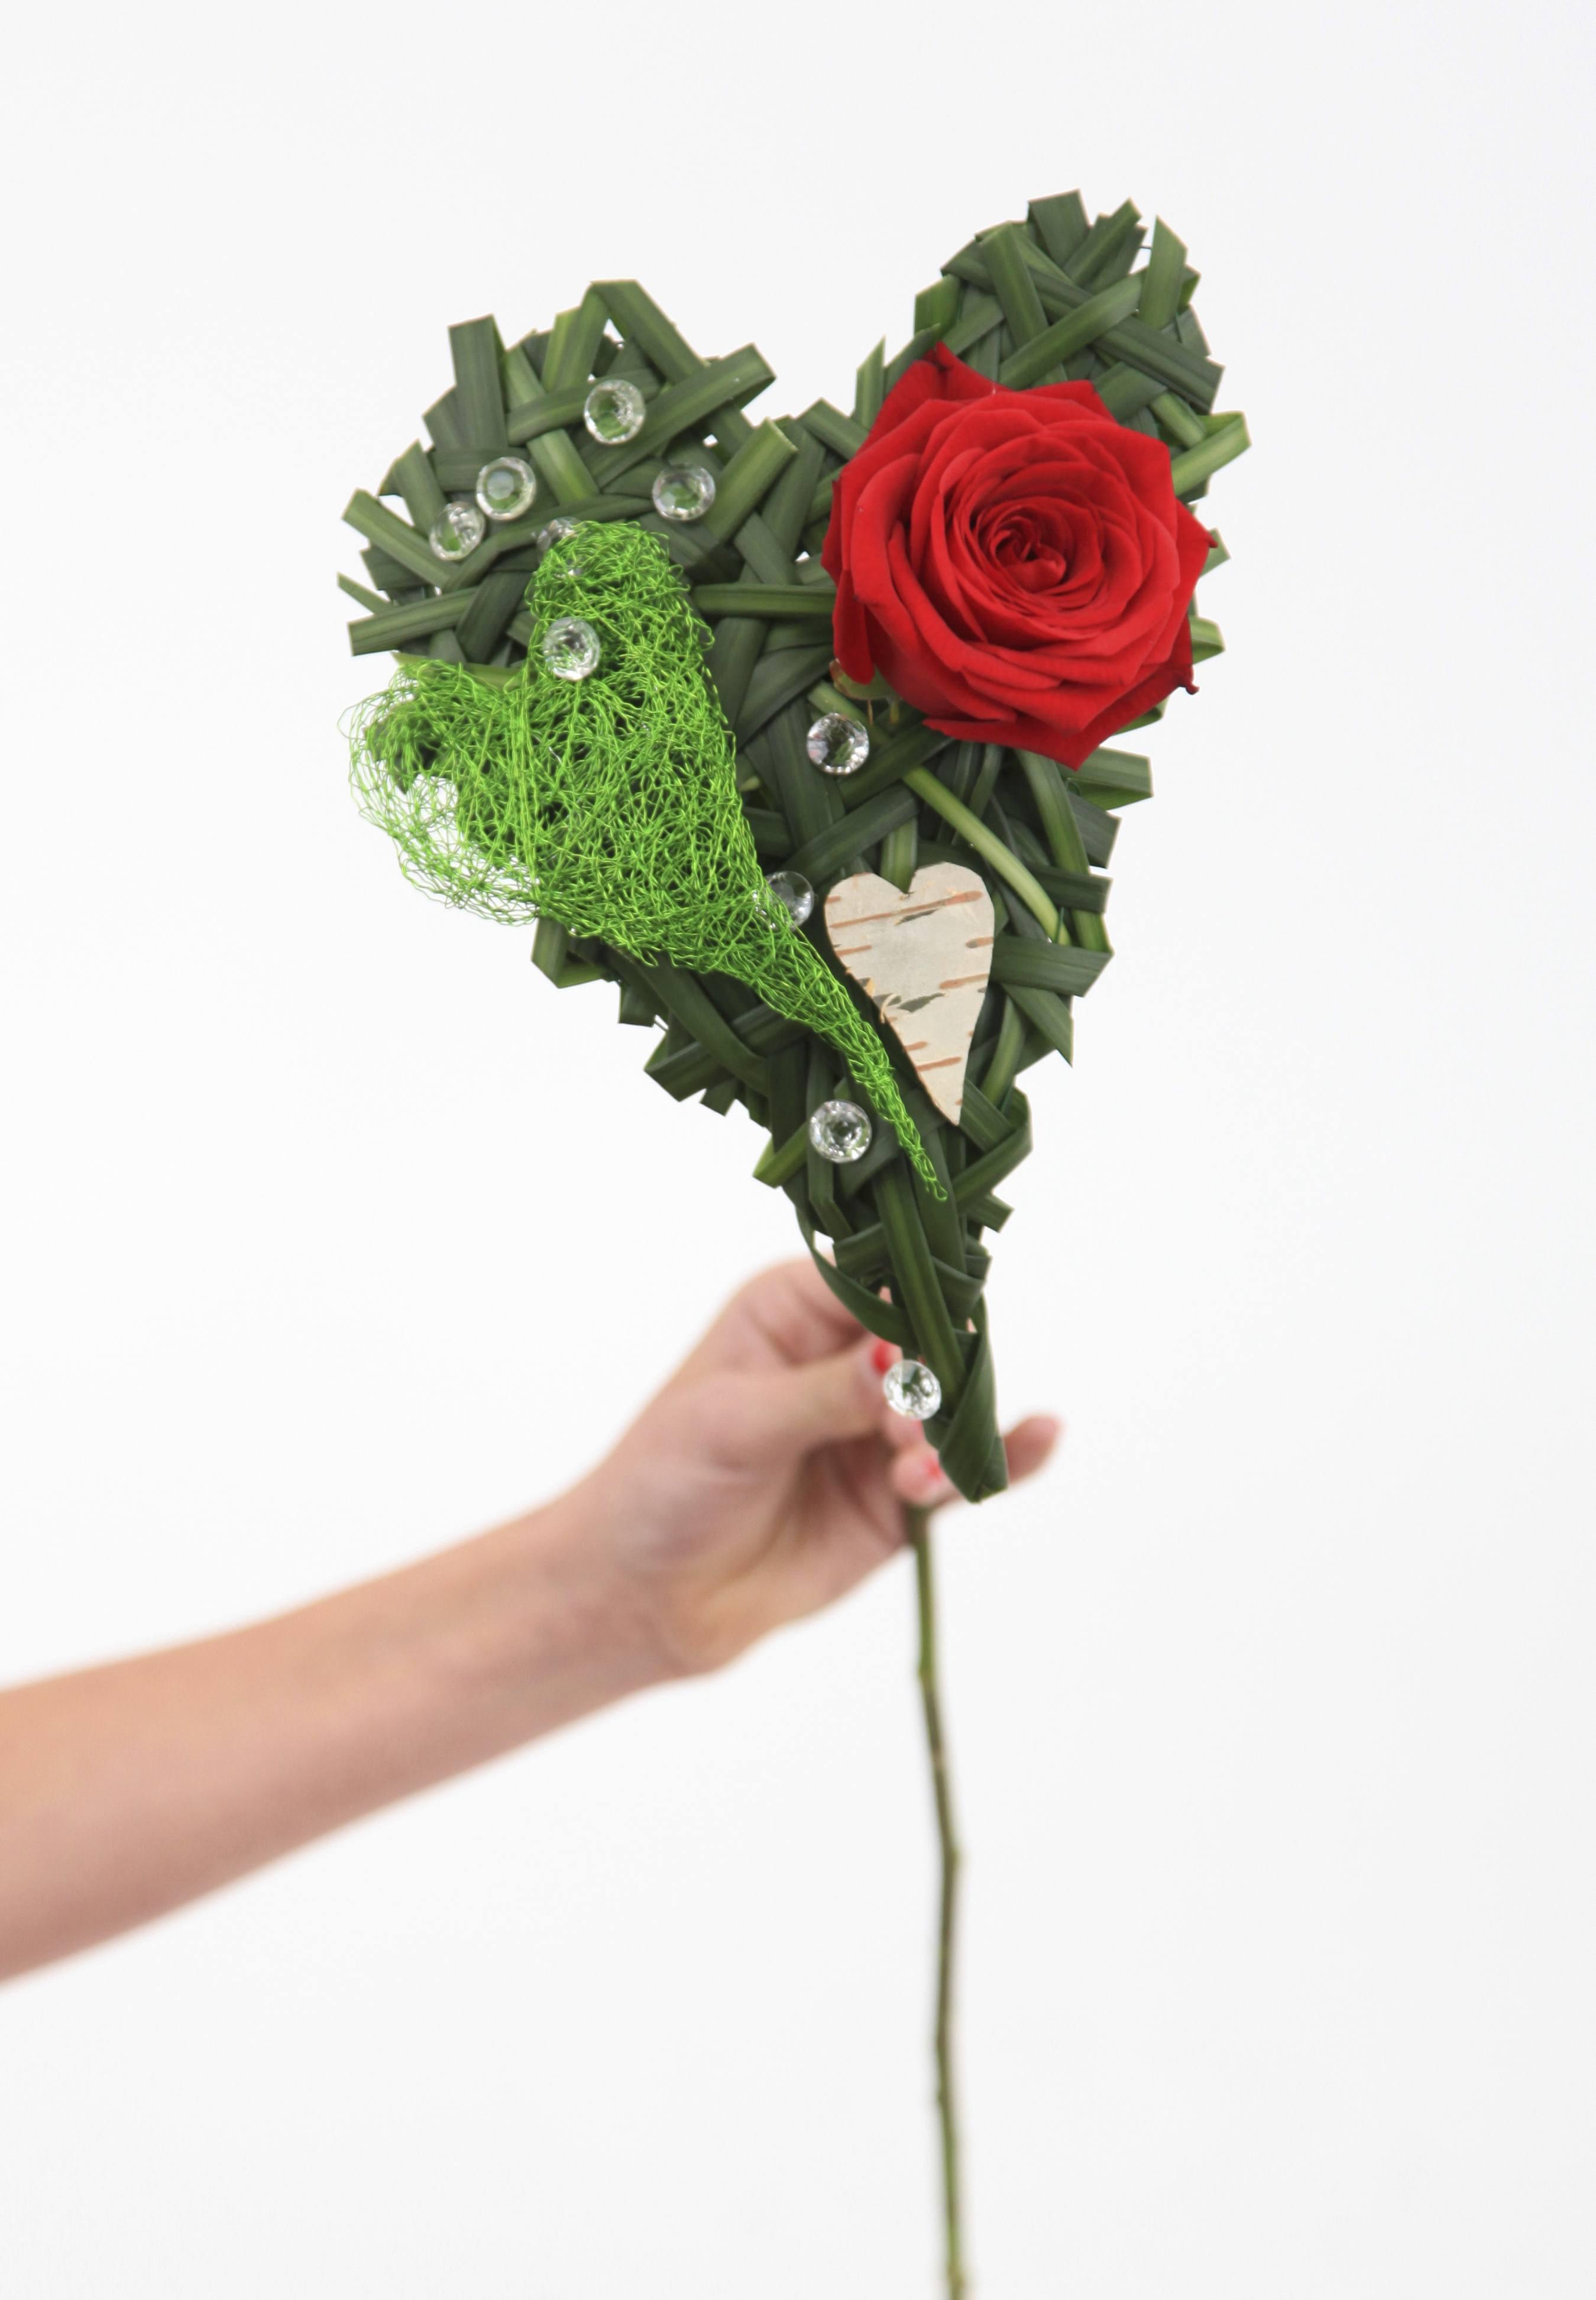 porta nova Valentine's Day ultimate symbol of love